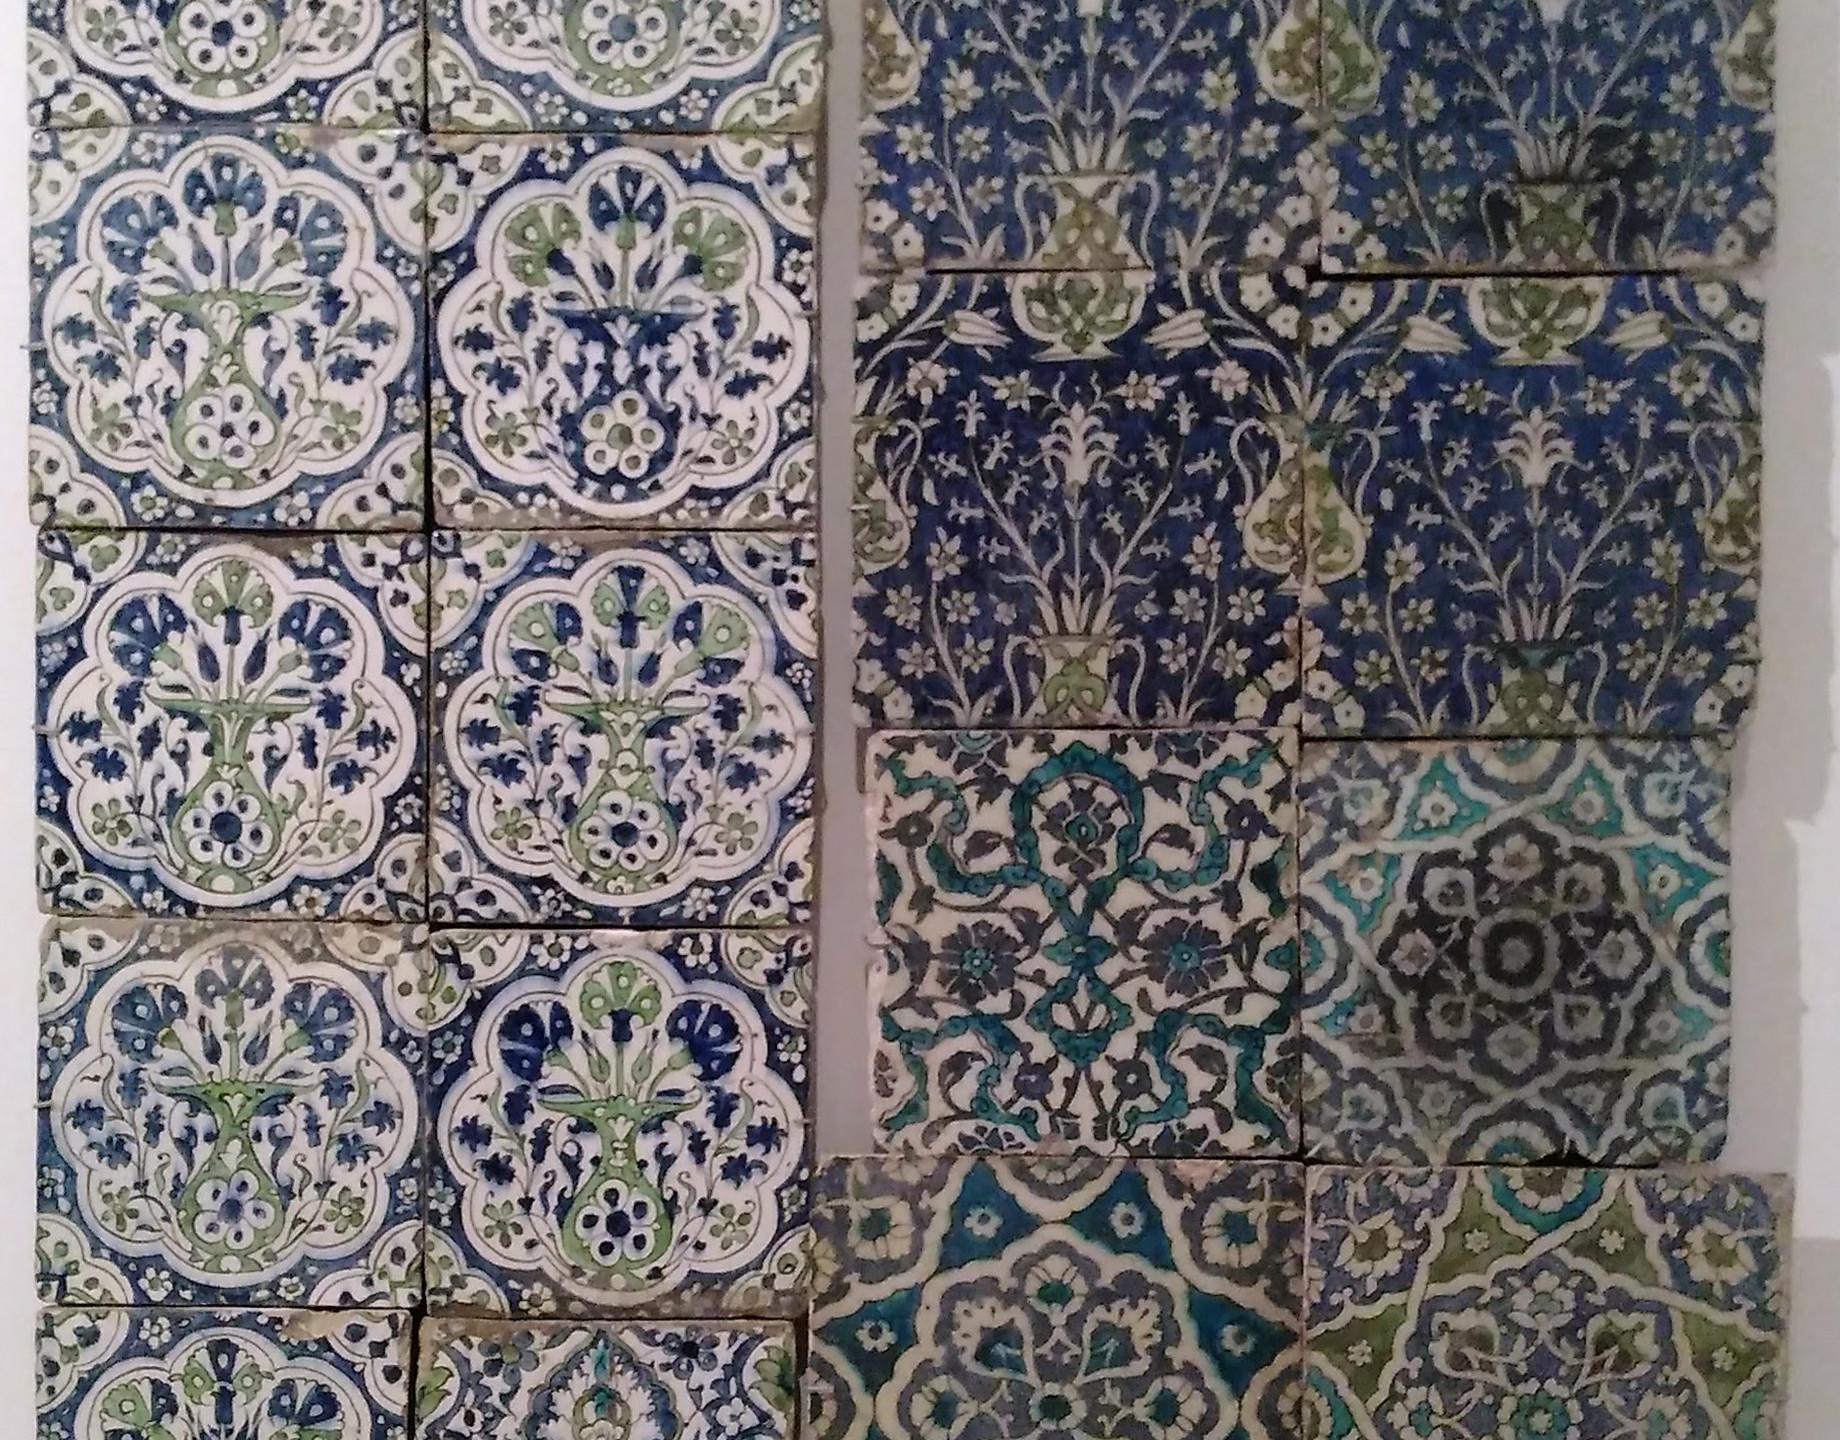 Syrian tiles